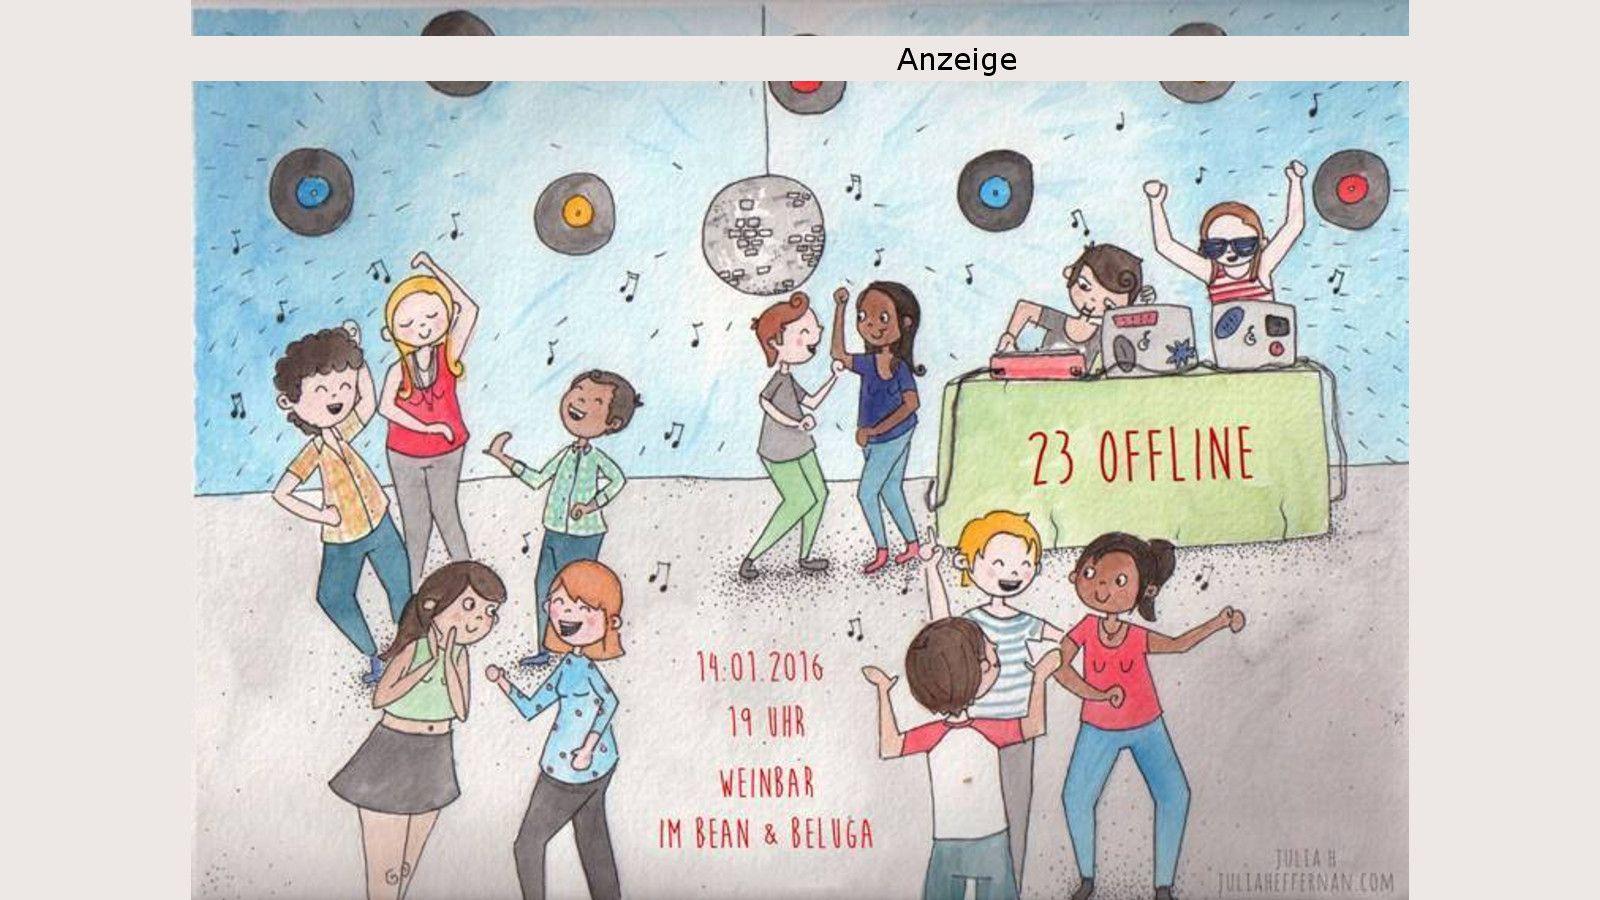 23 offline - am 14. Januar im Bean & Beluga